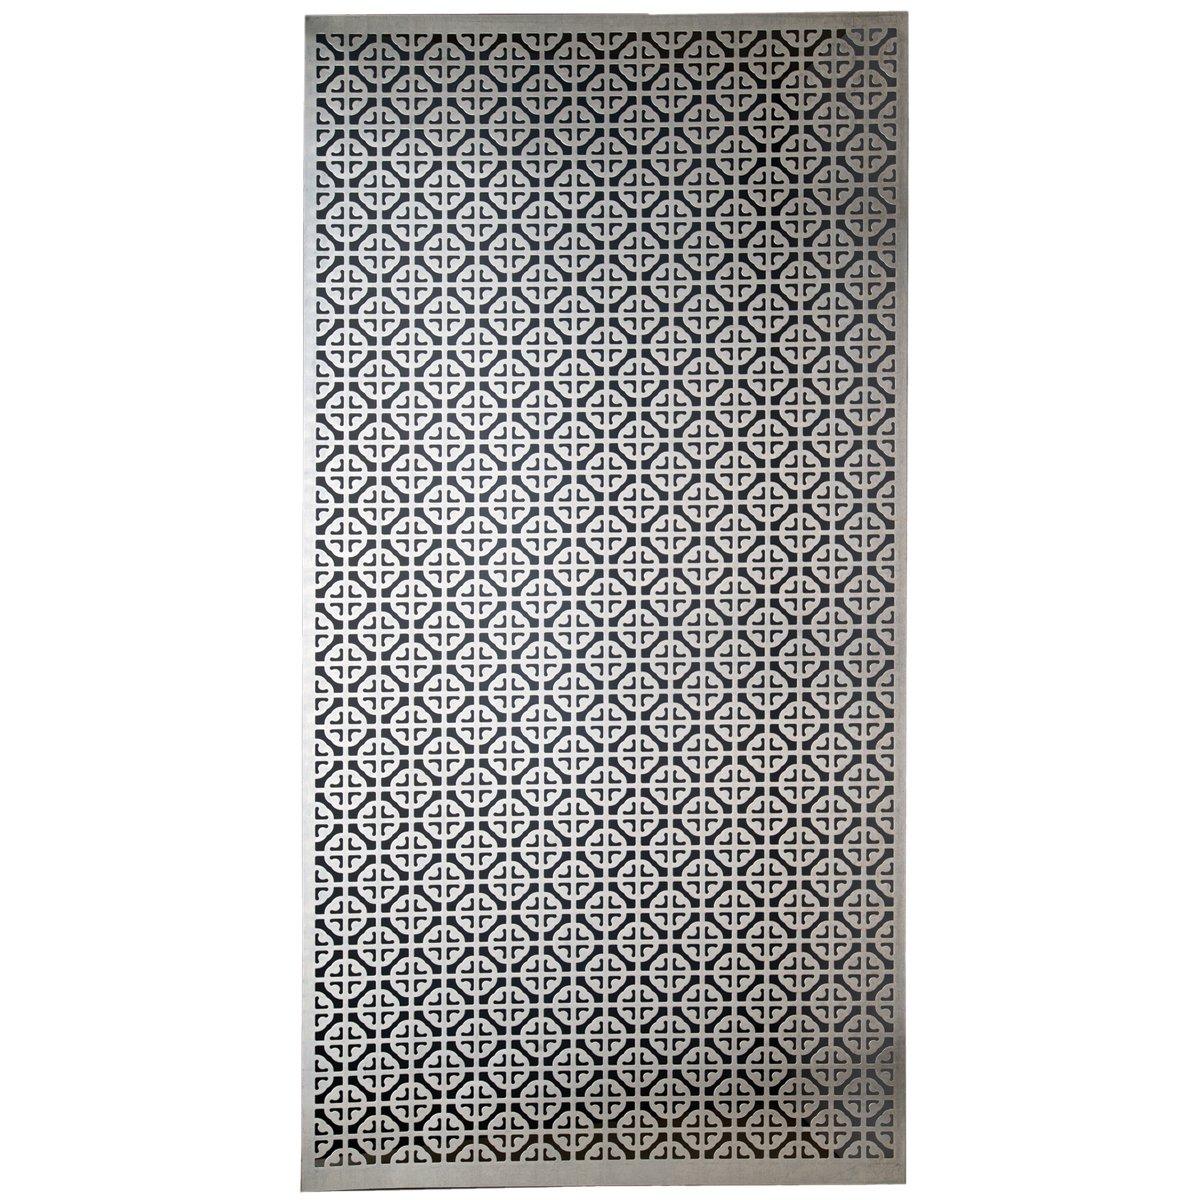 M-D Building Products 57326 Decorative Mosaic Aluminum Sheet ...